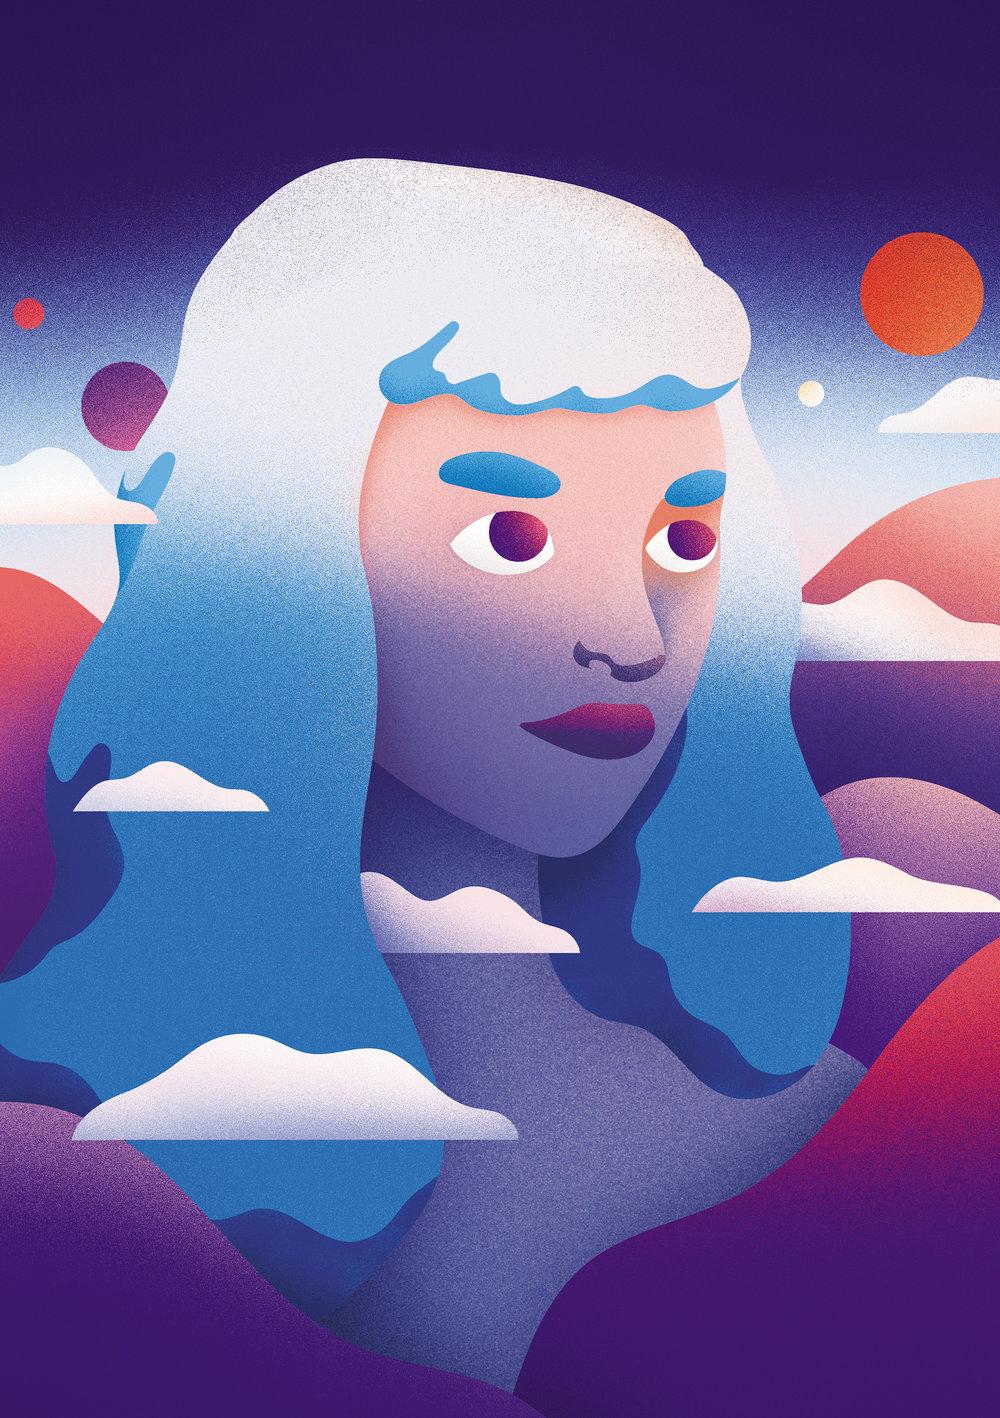 Victoria-Roussel-illustration-art-1.jpg